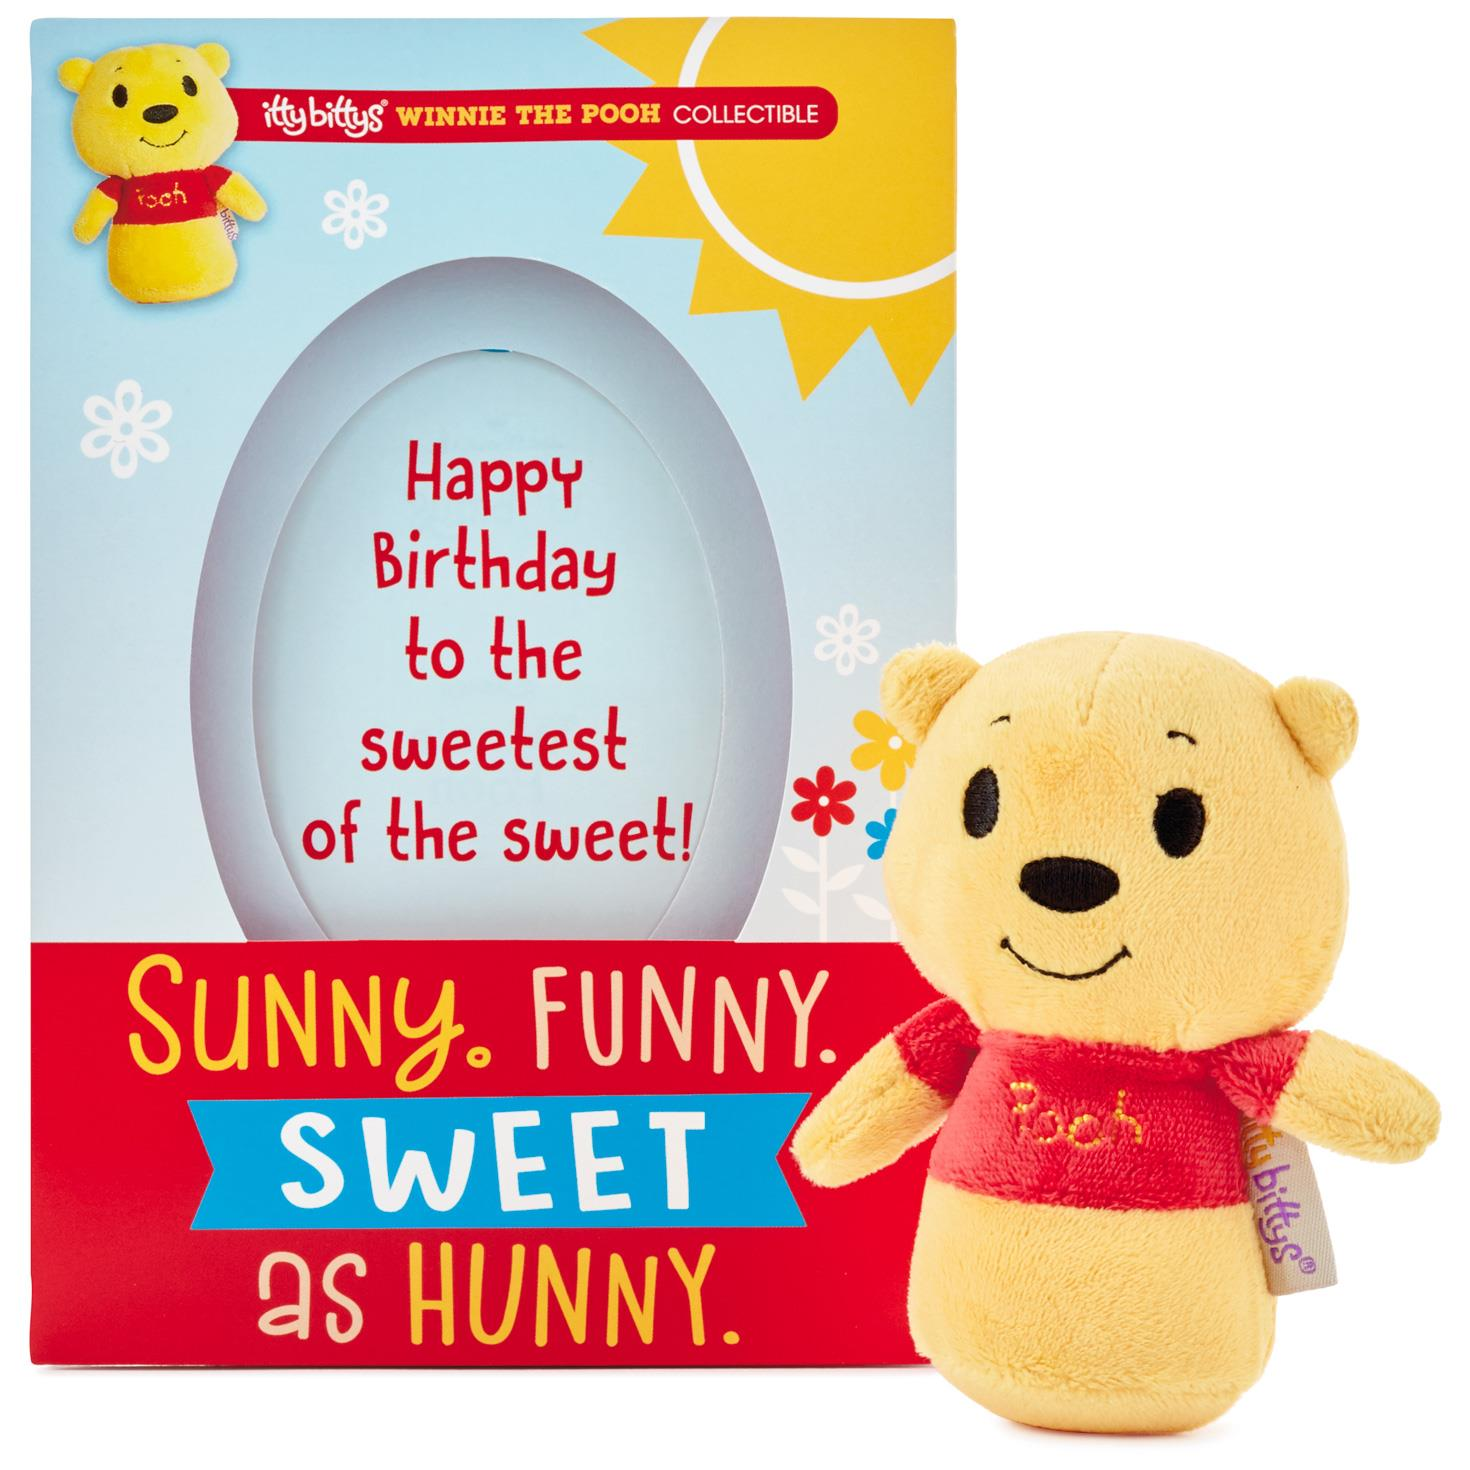 itty bittys Winnie the Pooh Birthday Card With Stuffed Animal